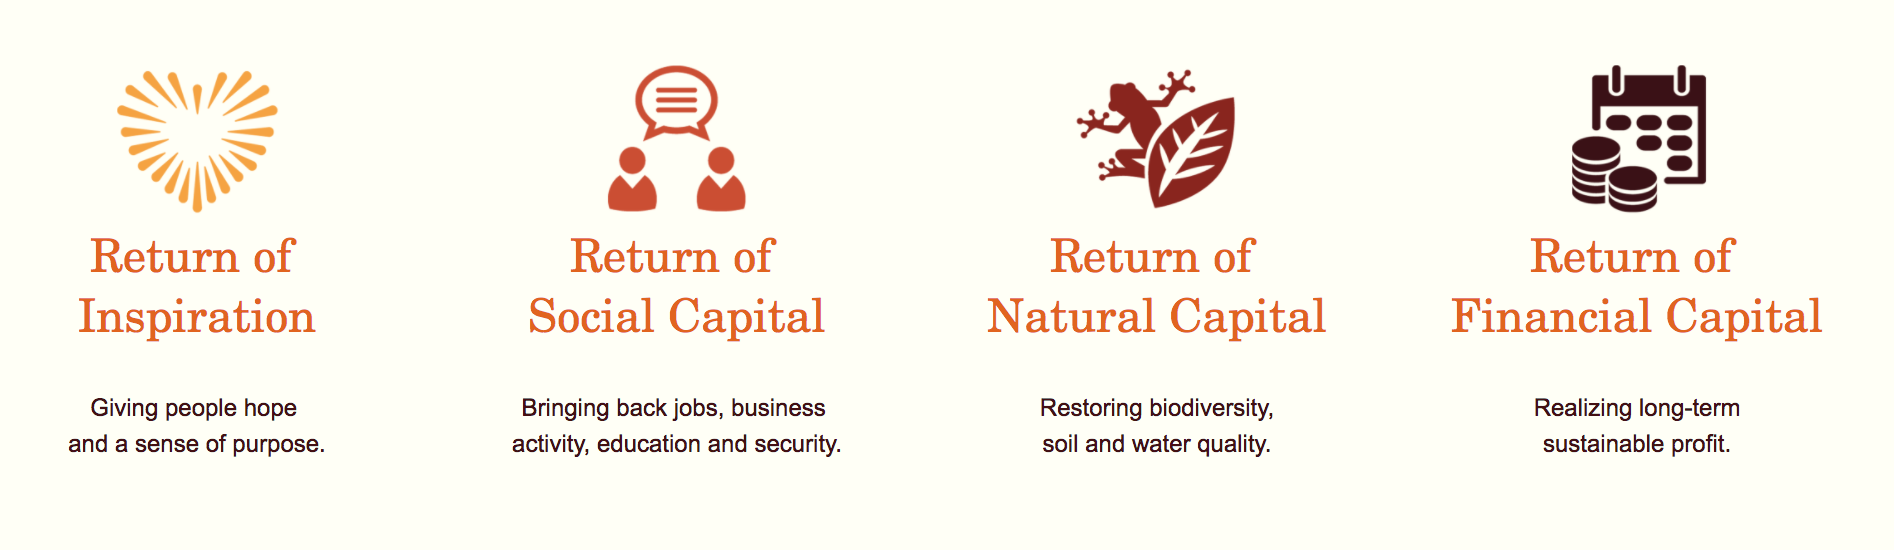 Return of social capital